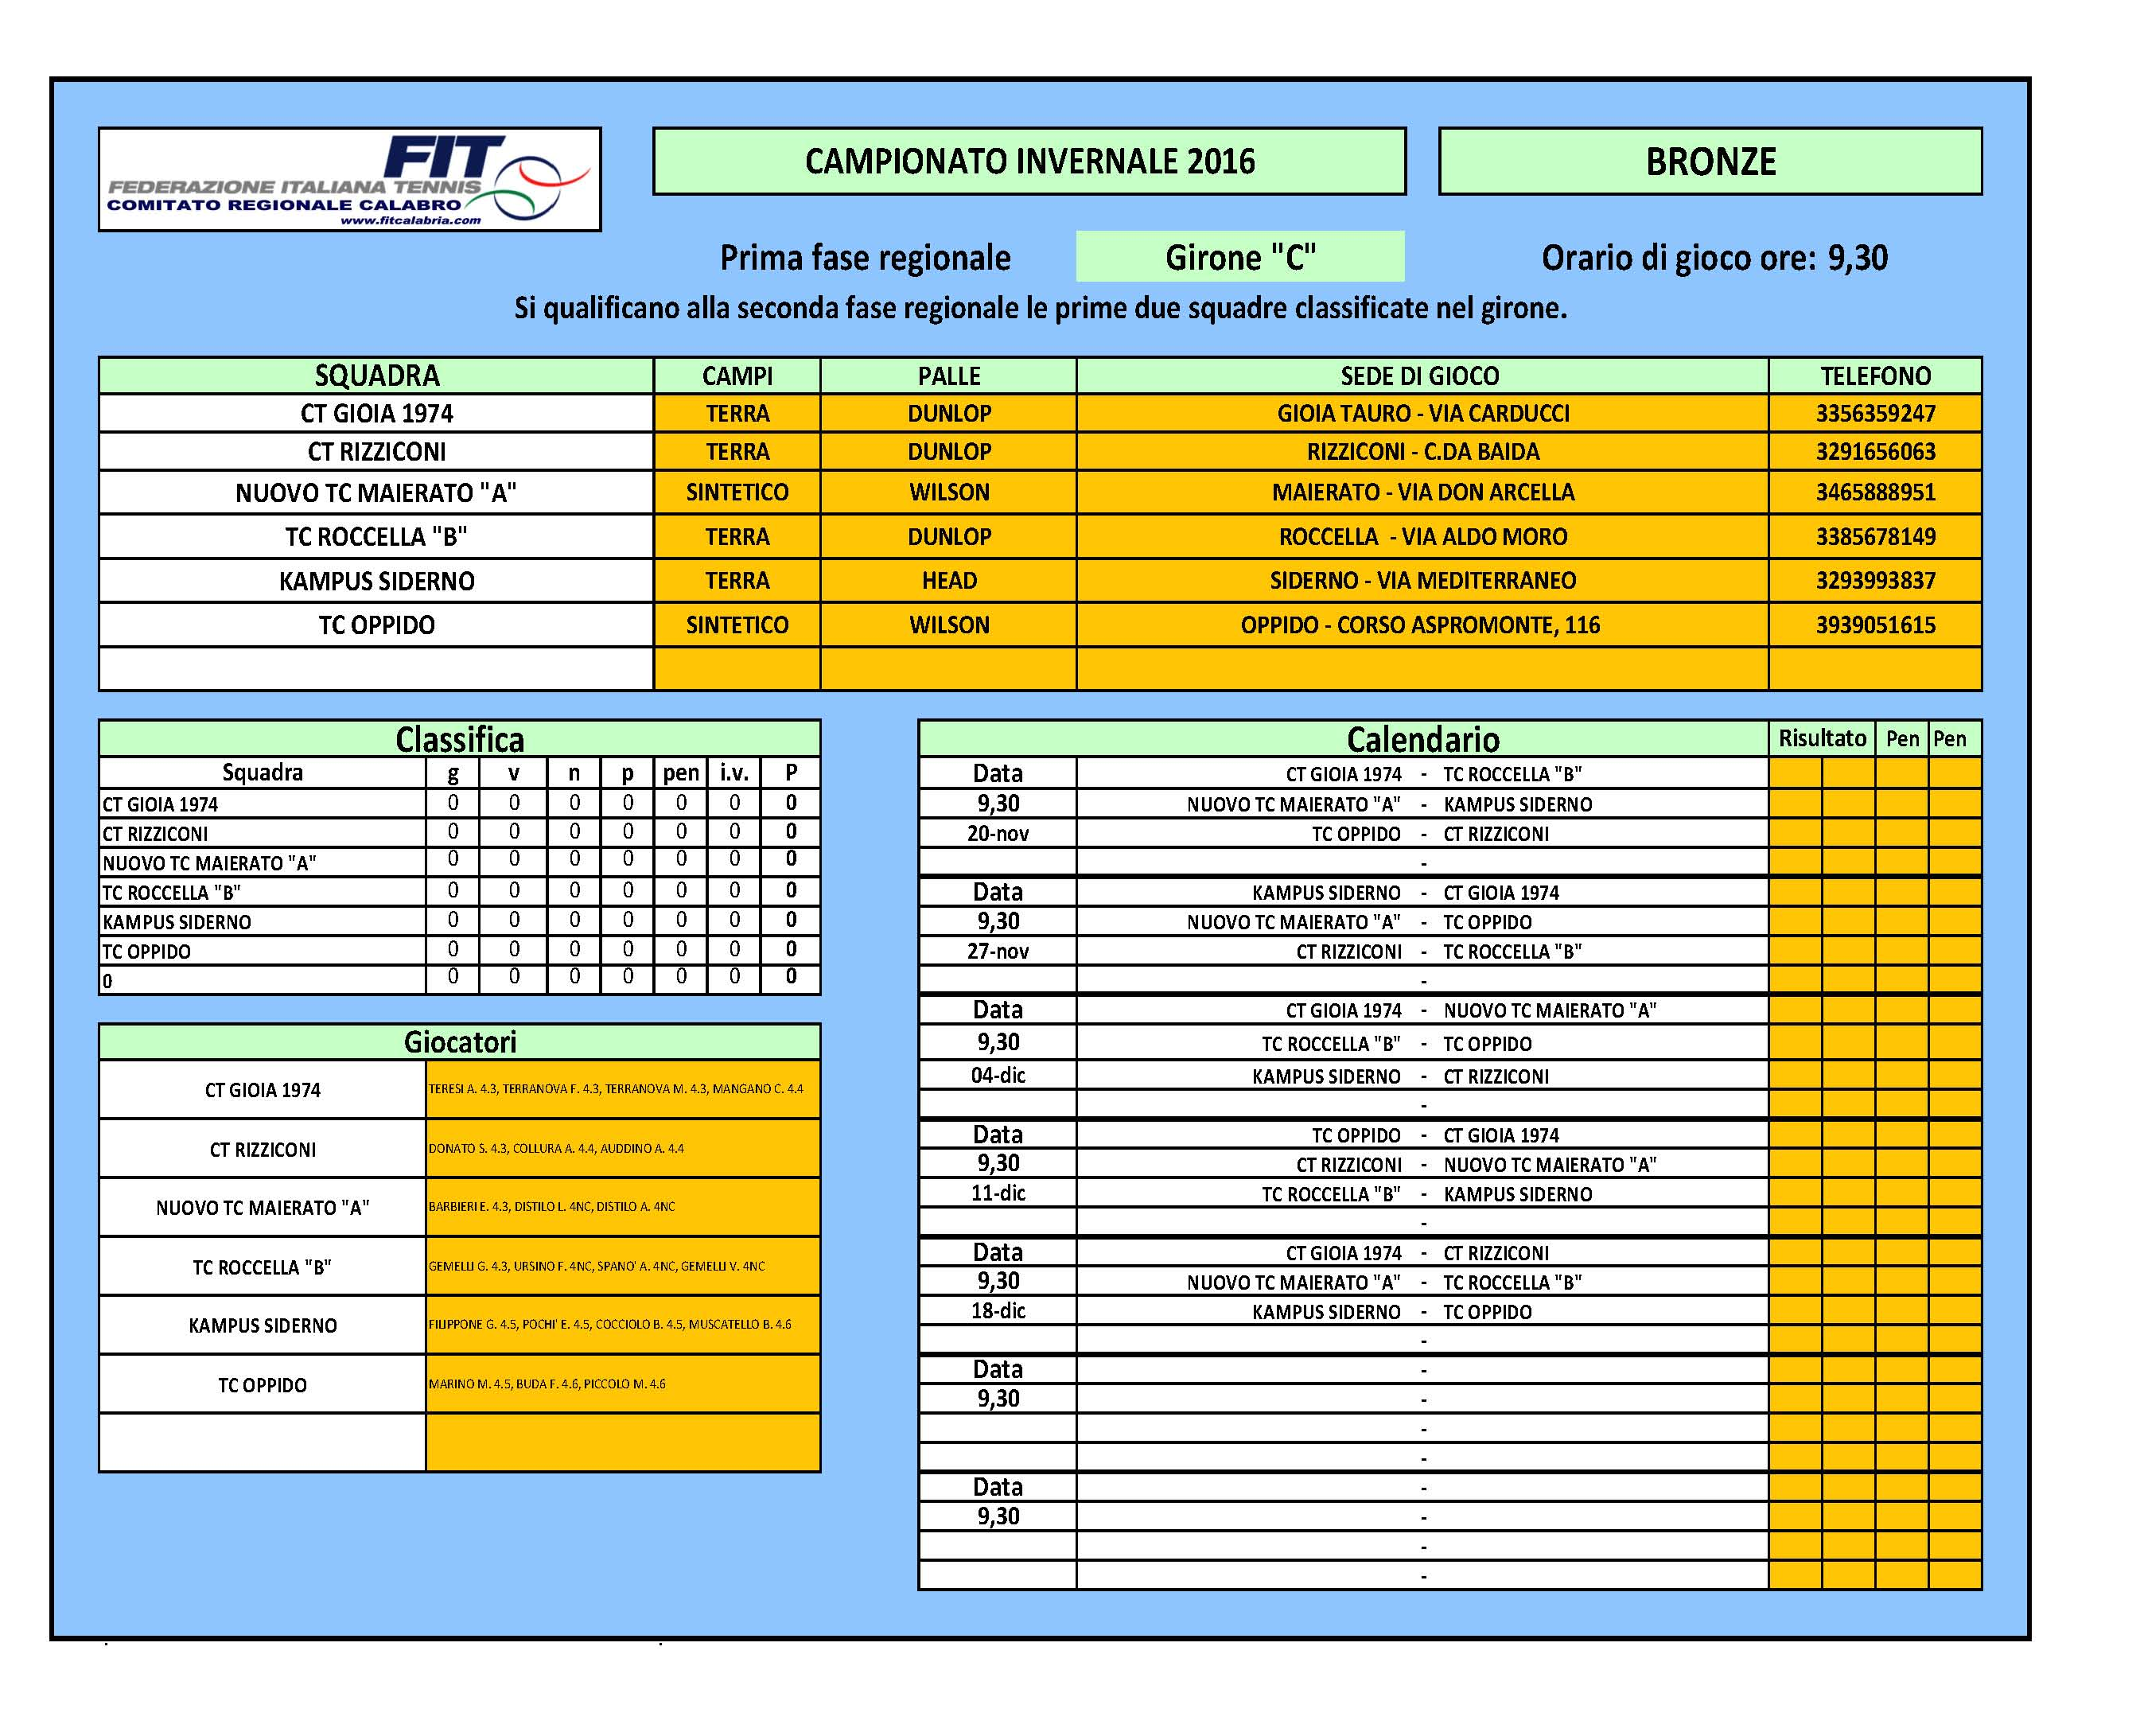 calendario-bronze-m-2016-girone-c